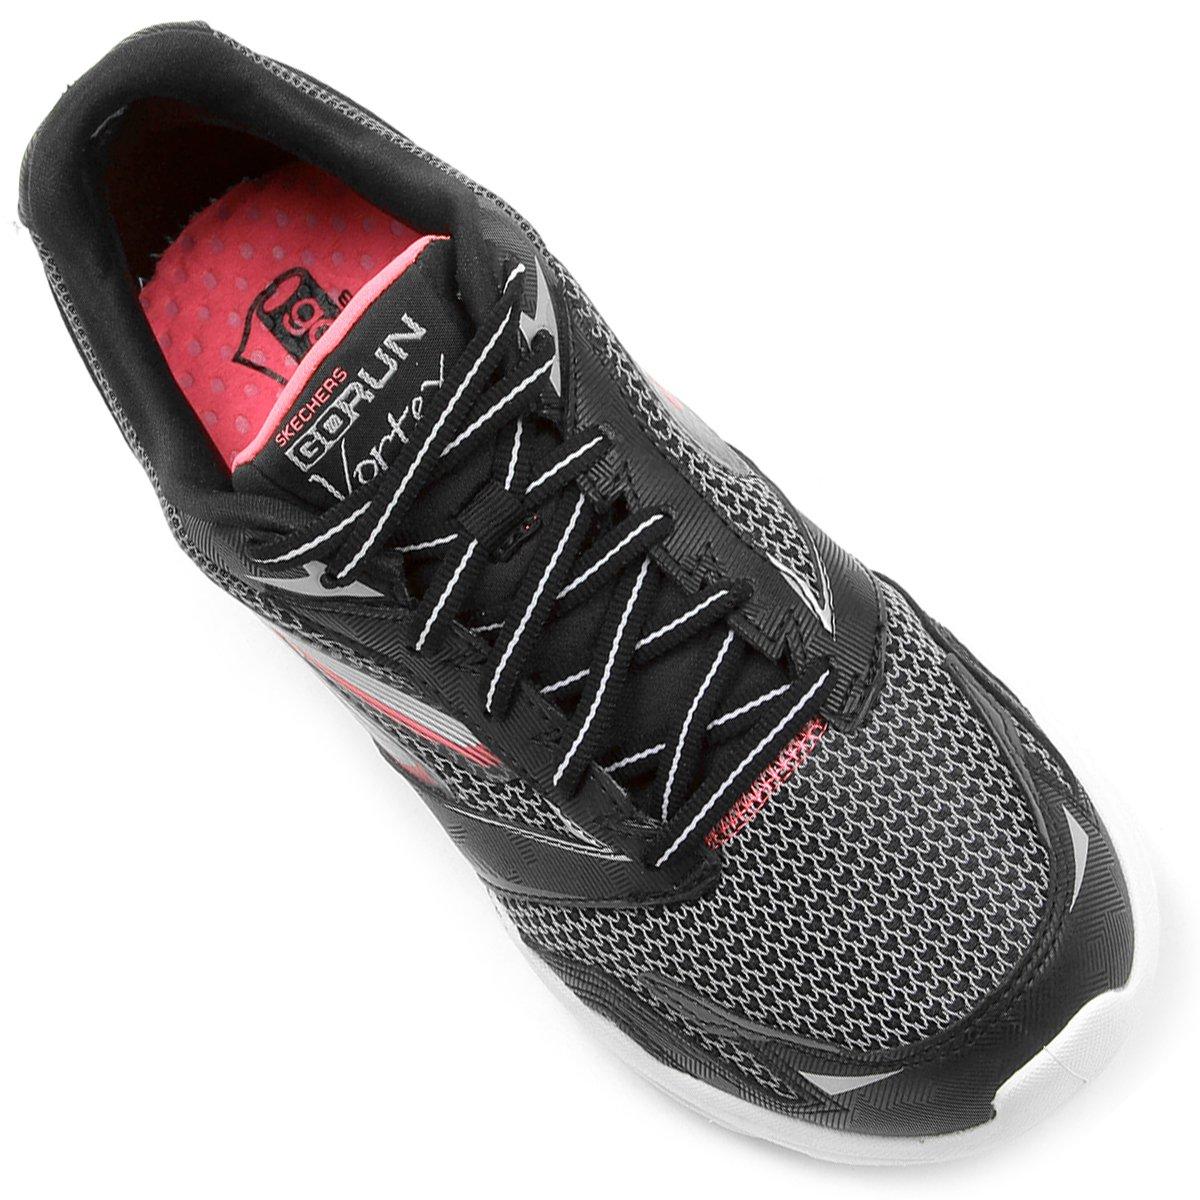 Tênis Skechers Go Run Vortex Feminino - Preto e Rosa - Compre Agora . c37b416d0f28a